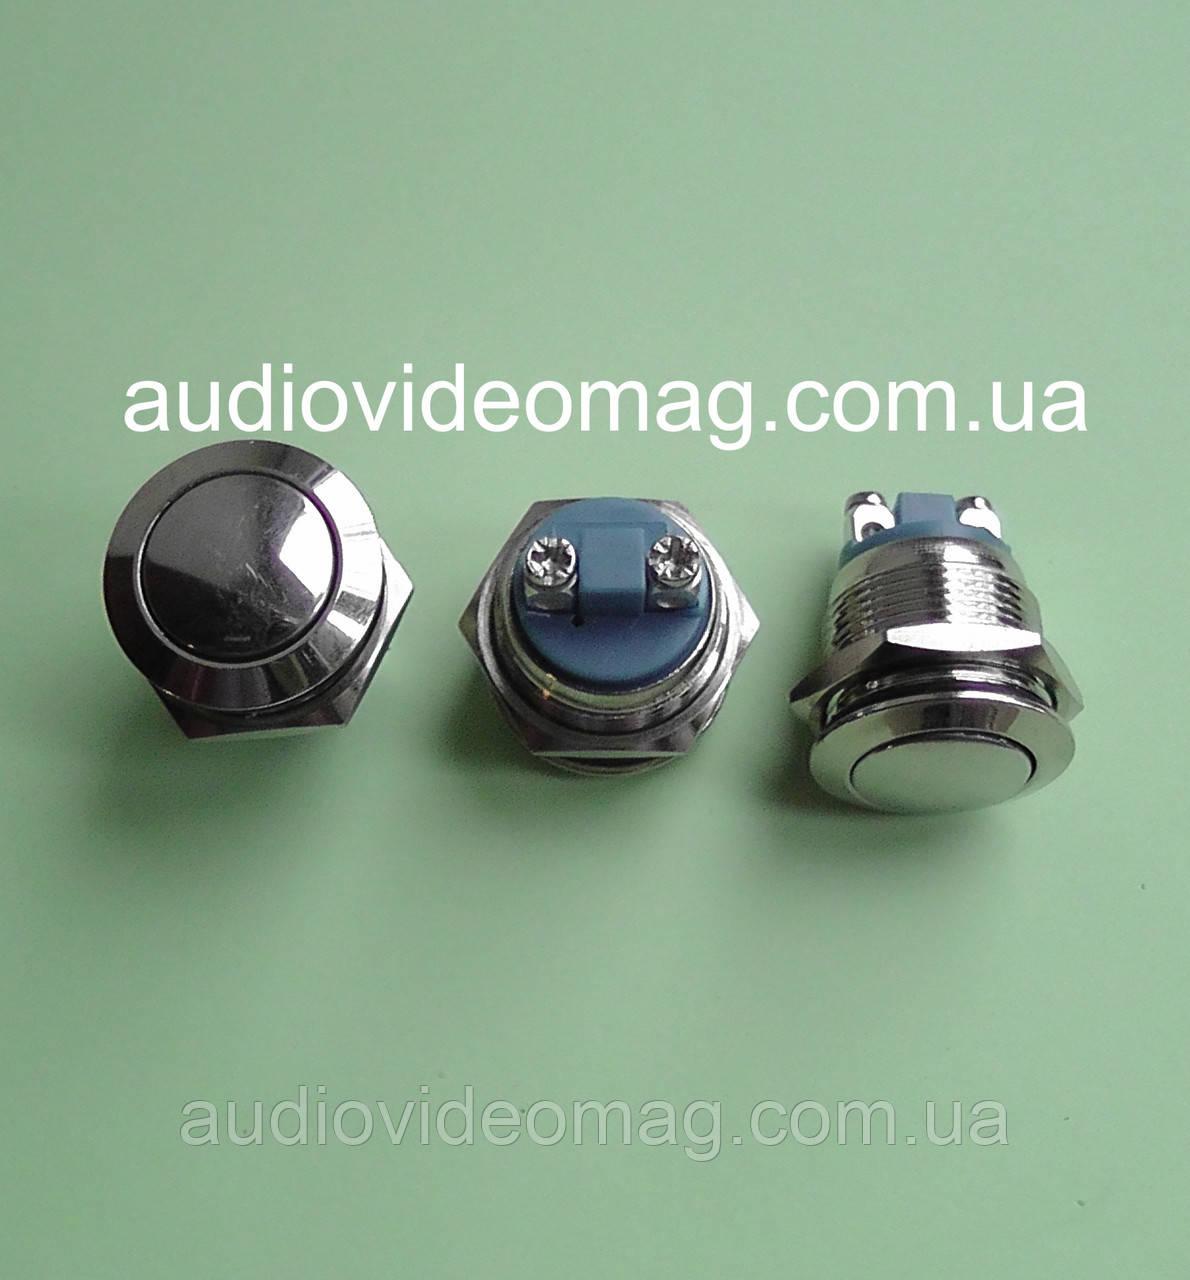 Кнопка антивандальная  220V 2А, Ø 19мм, без фиксации, OFF-ON, двухфазная